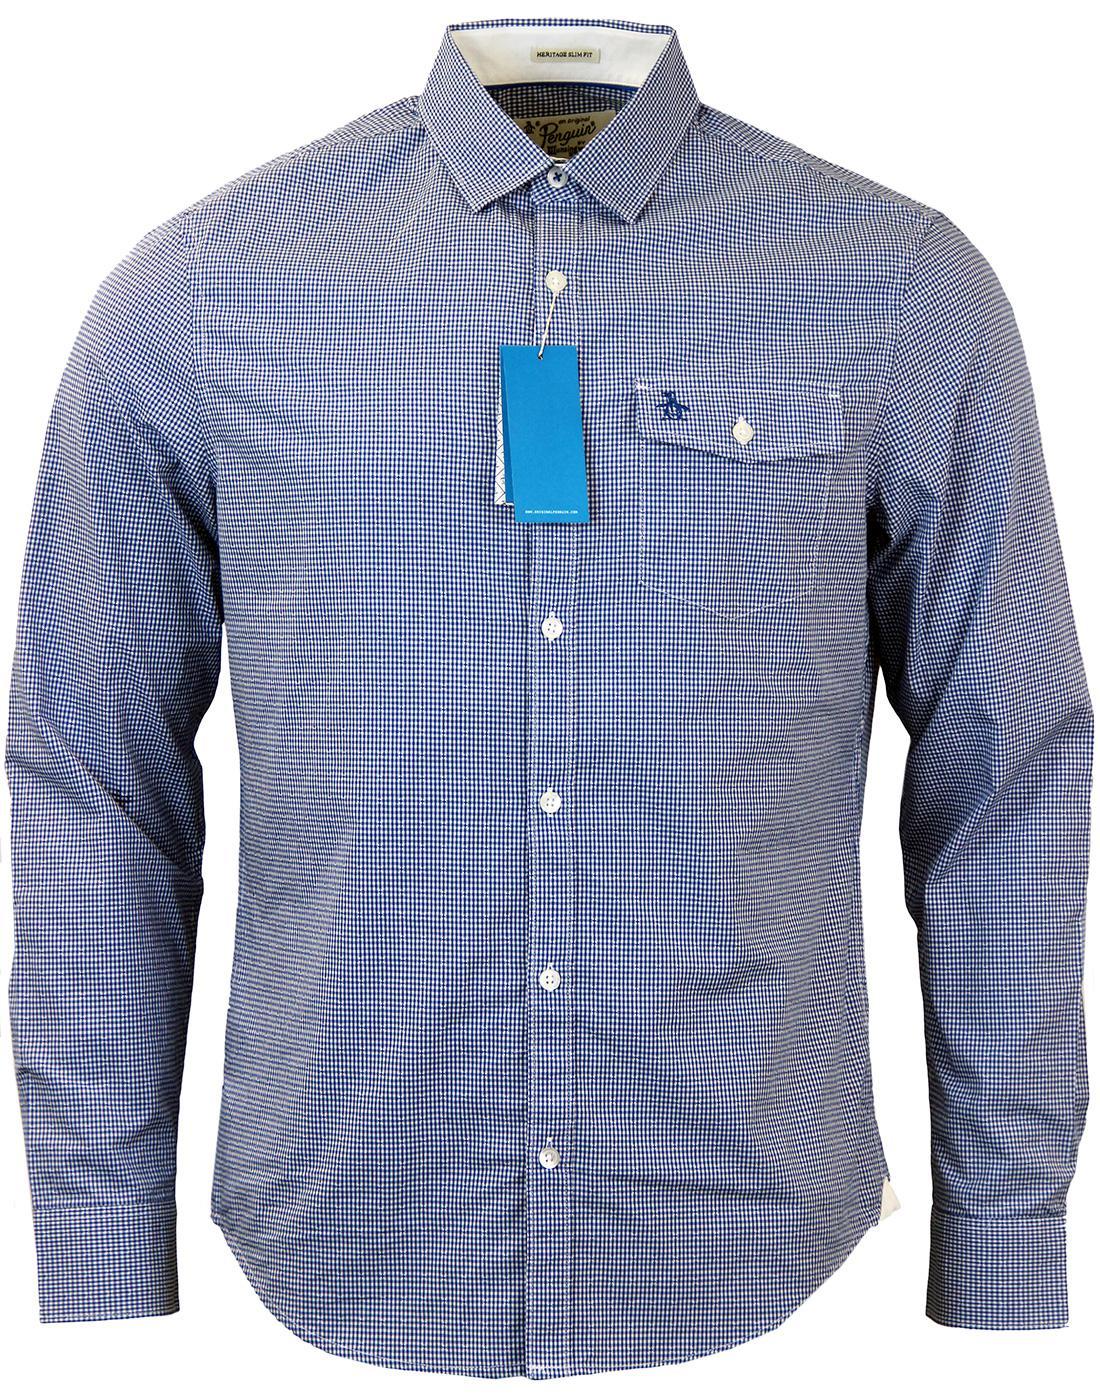 Facade ORIGINAL PENGUIN Mod Mini Gingham Shirt